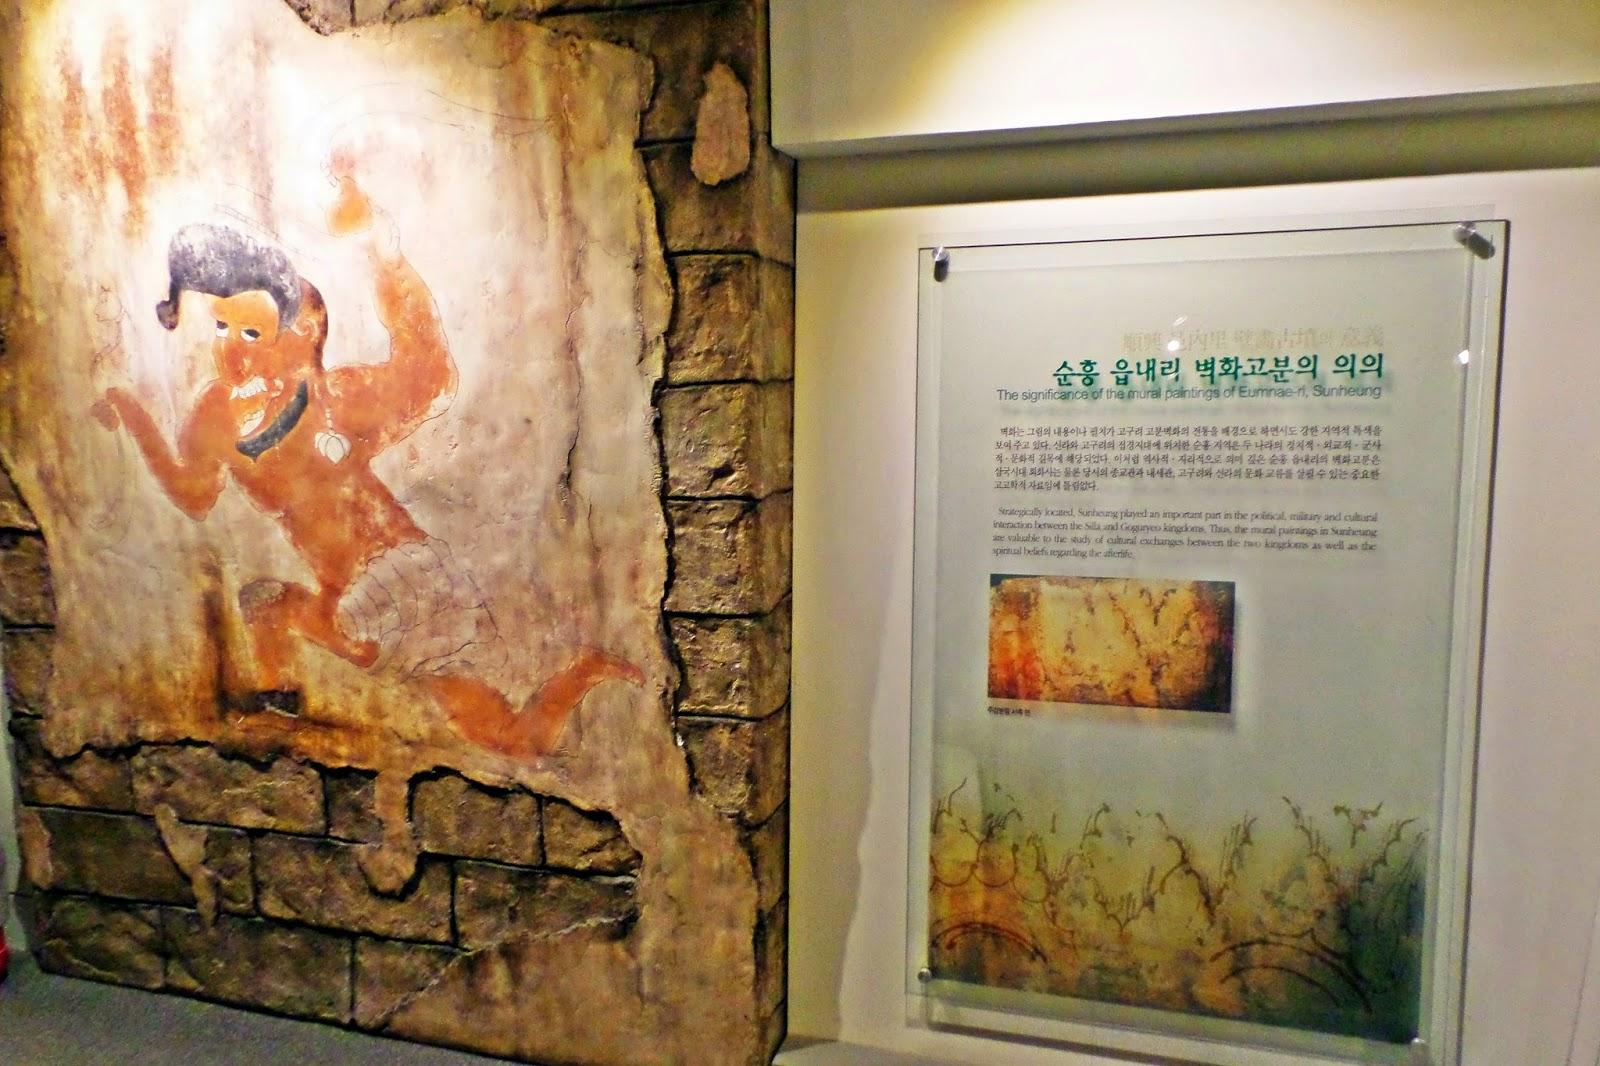 Yeongju Sosu Museum 소수박물관 | meheartsoul.blogspot.com